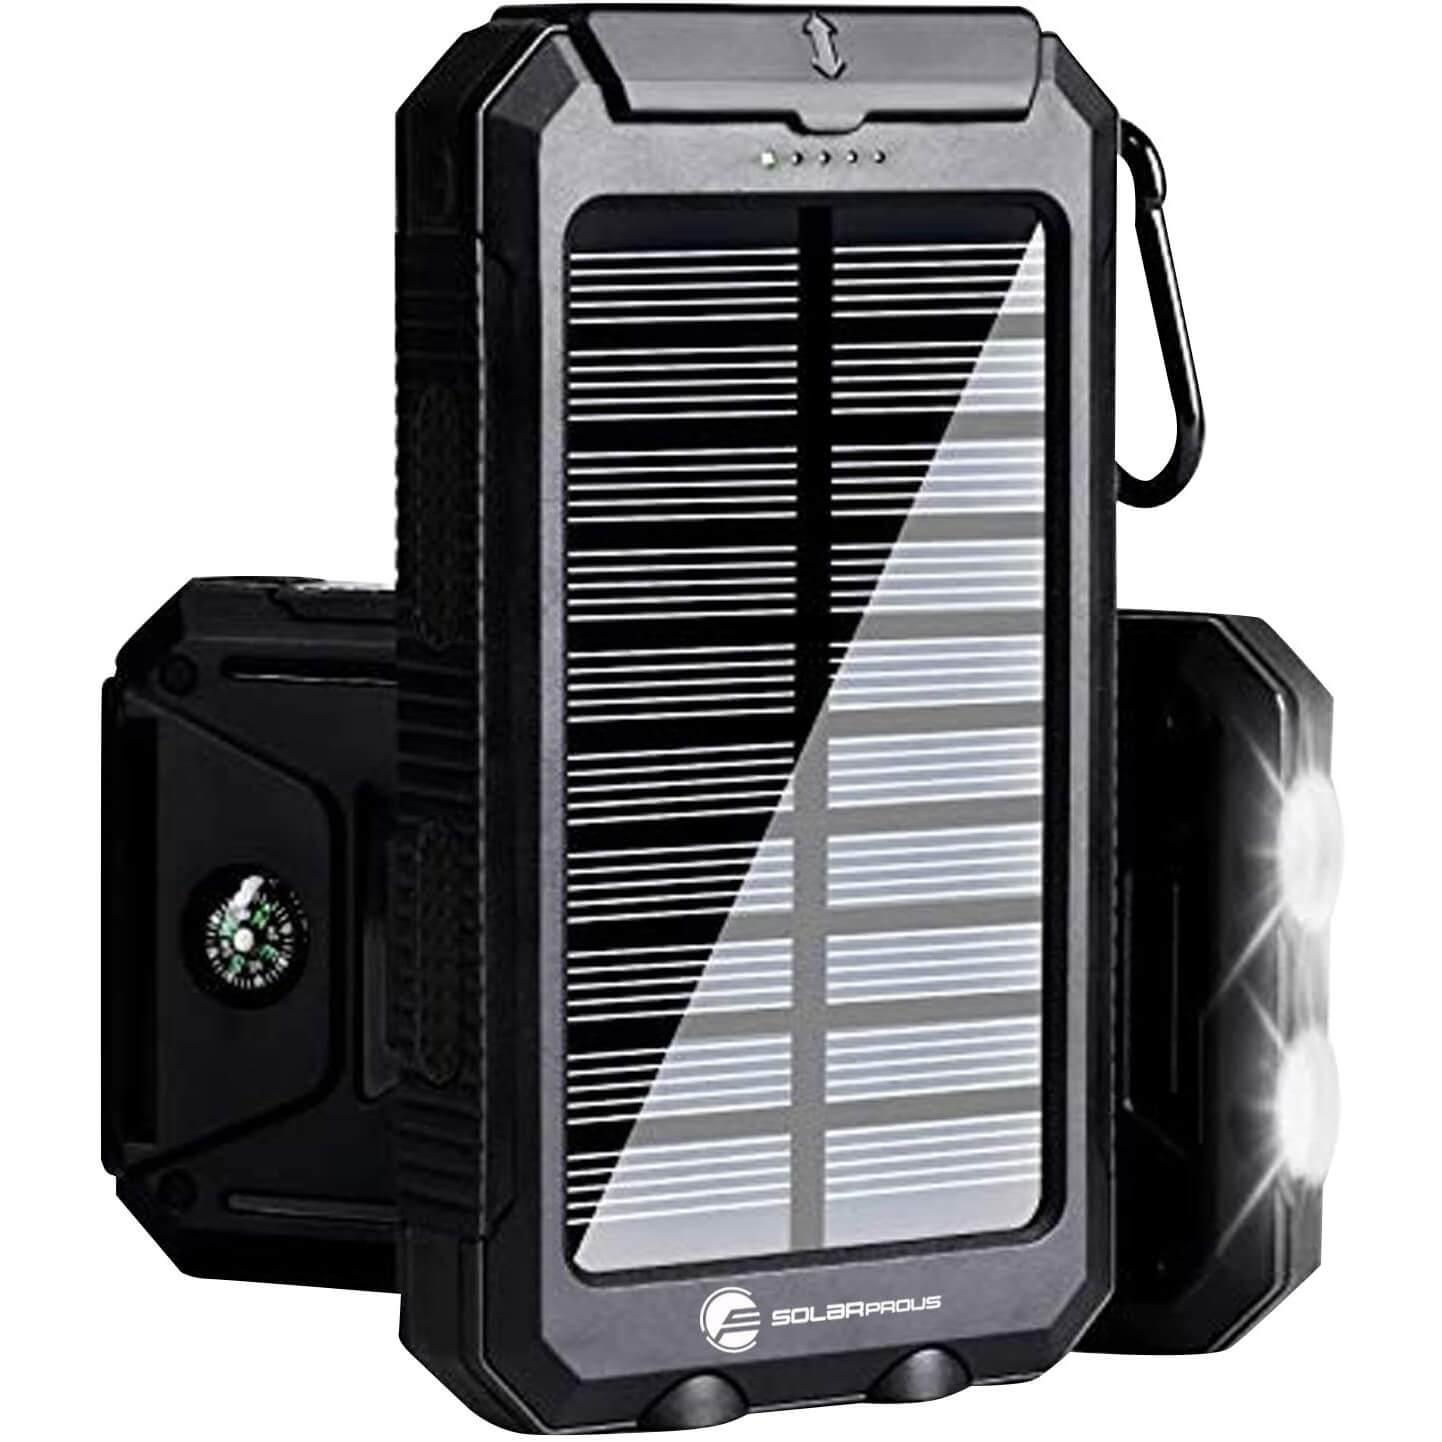 Solarprous Portable Power Bank